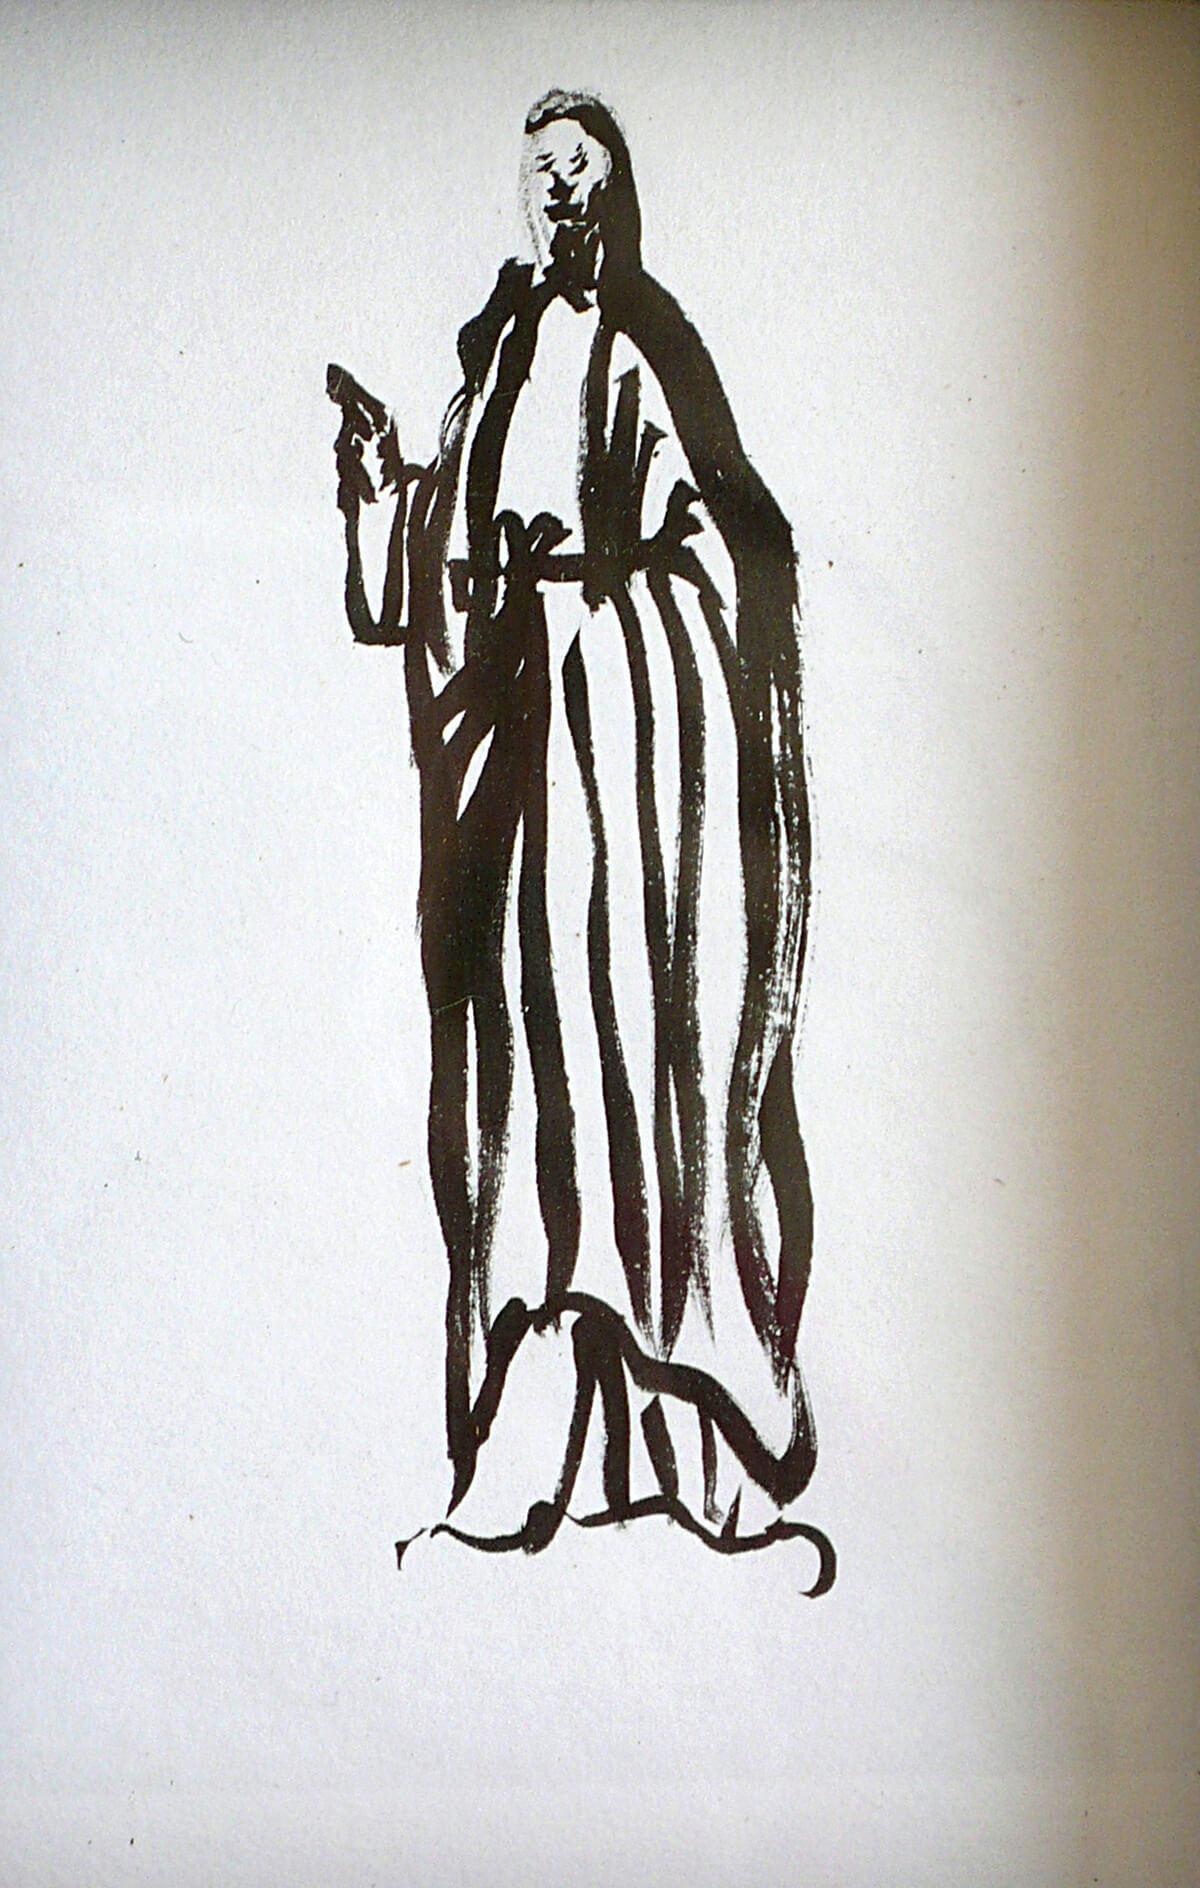 untitled (saint), 16 x 11 cm, ink on paper, 2014